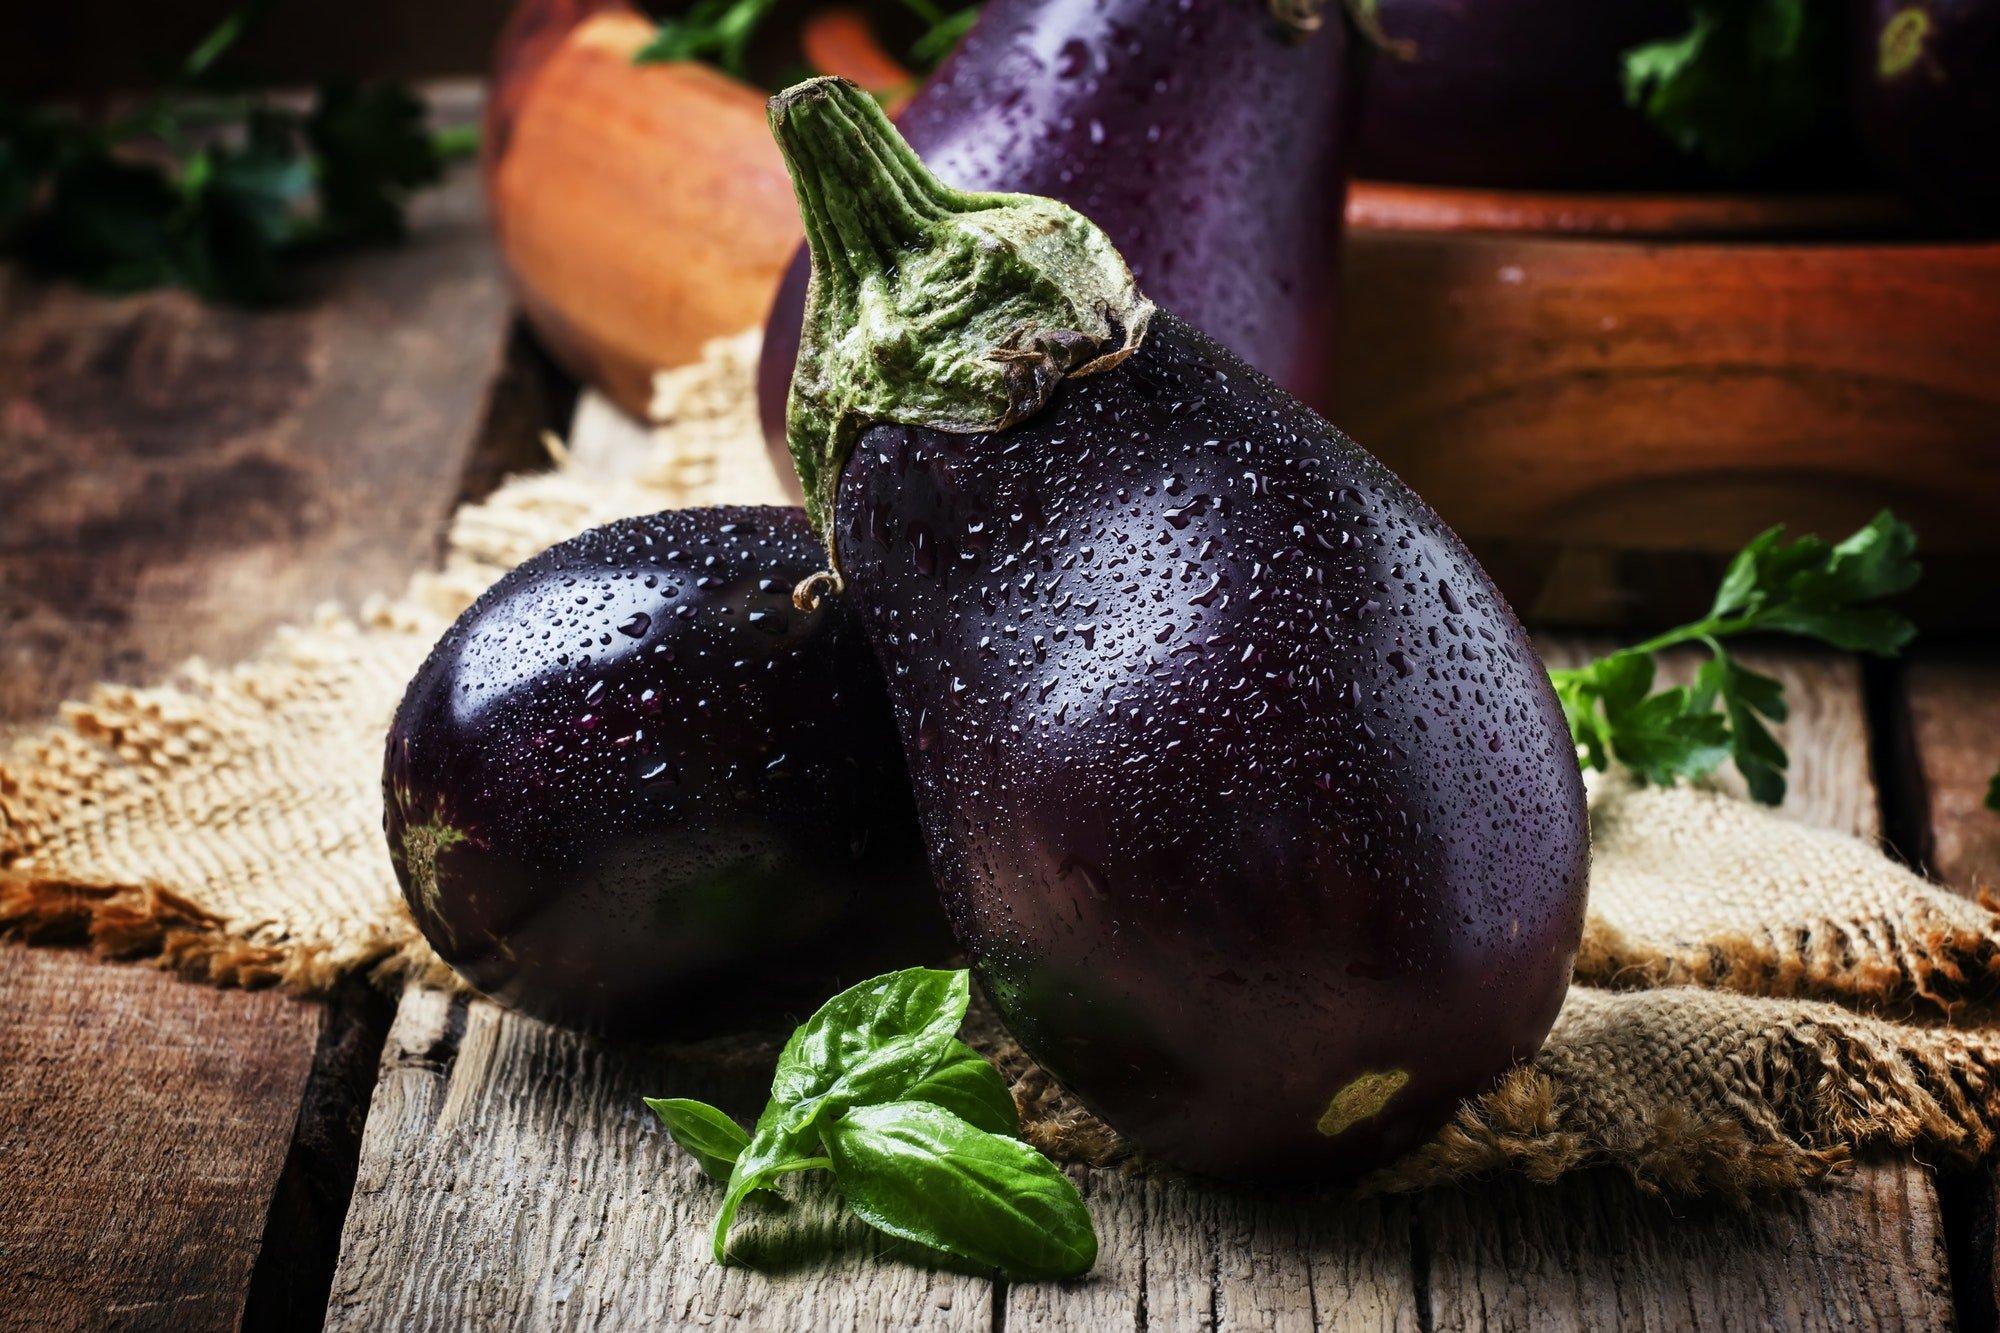 Fresh purple eggplants